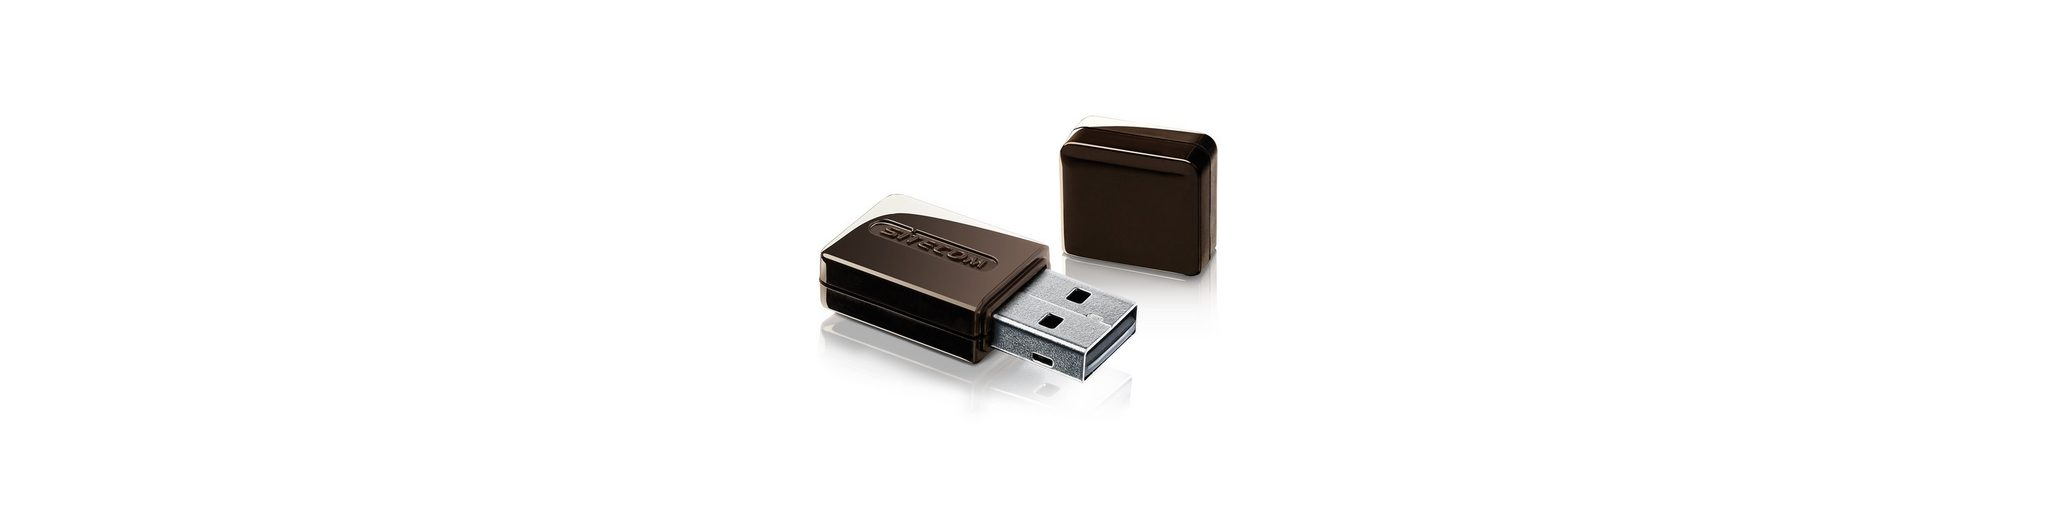 Sitecom Wlan USB Adapter »WLA-2100«